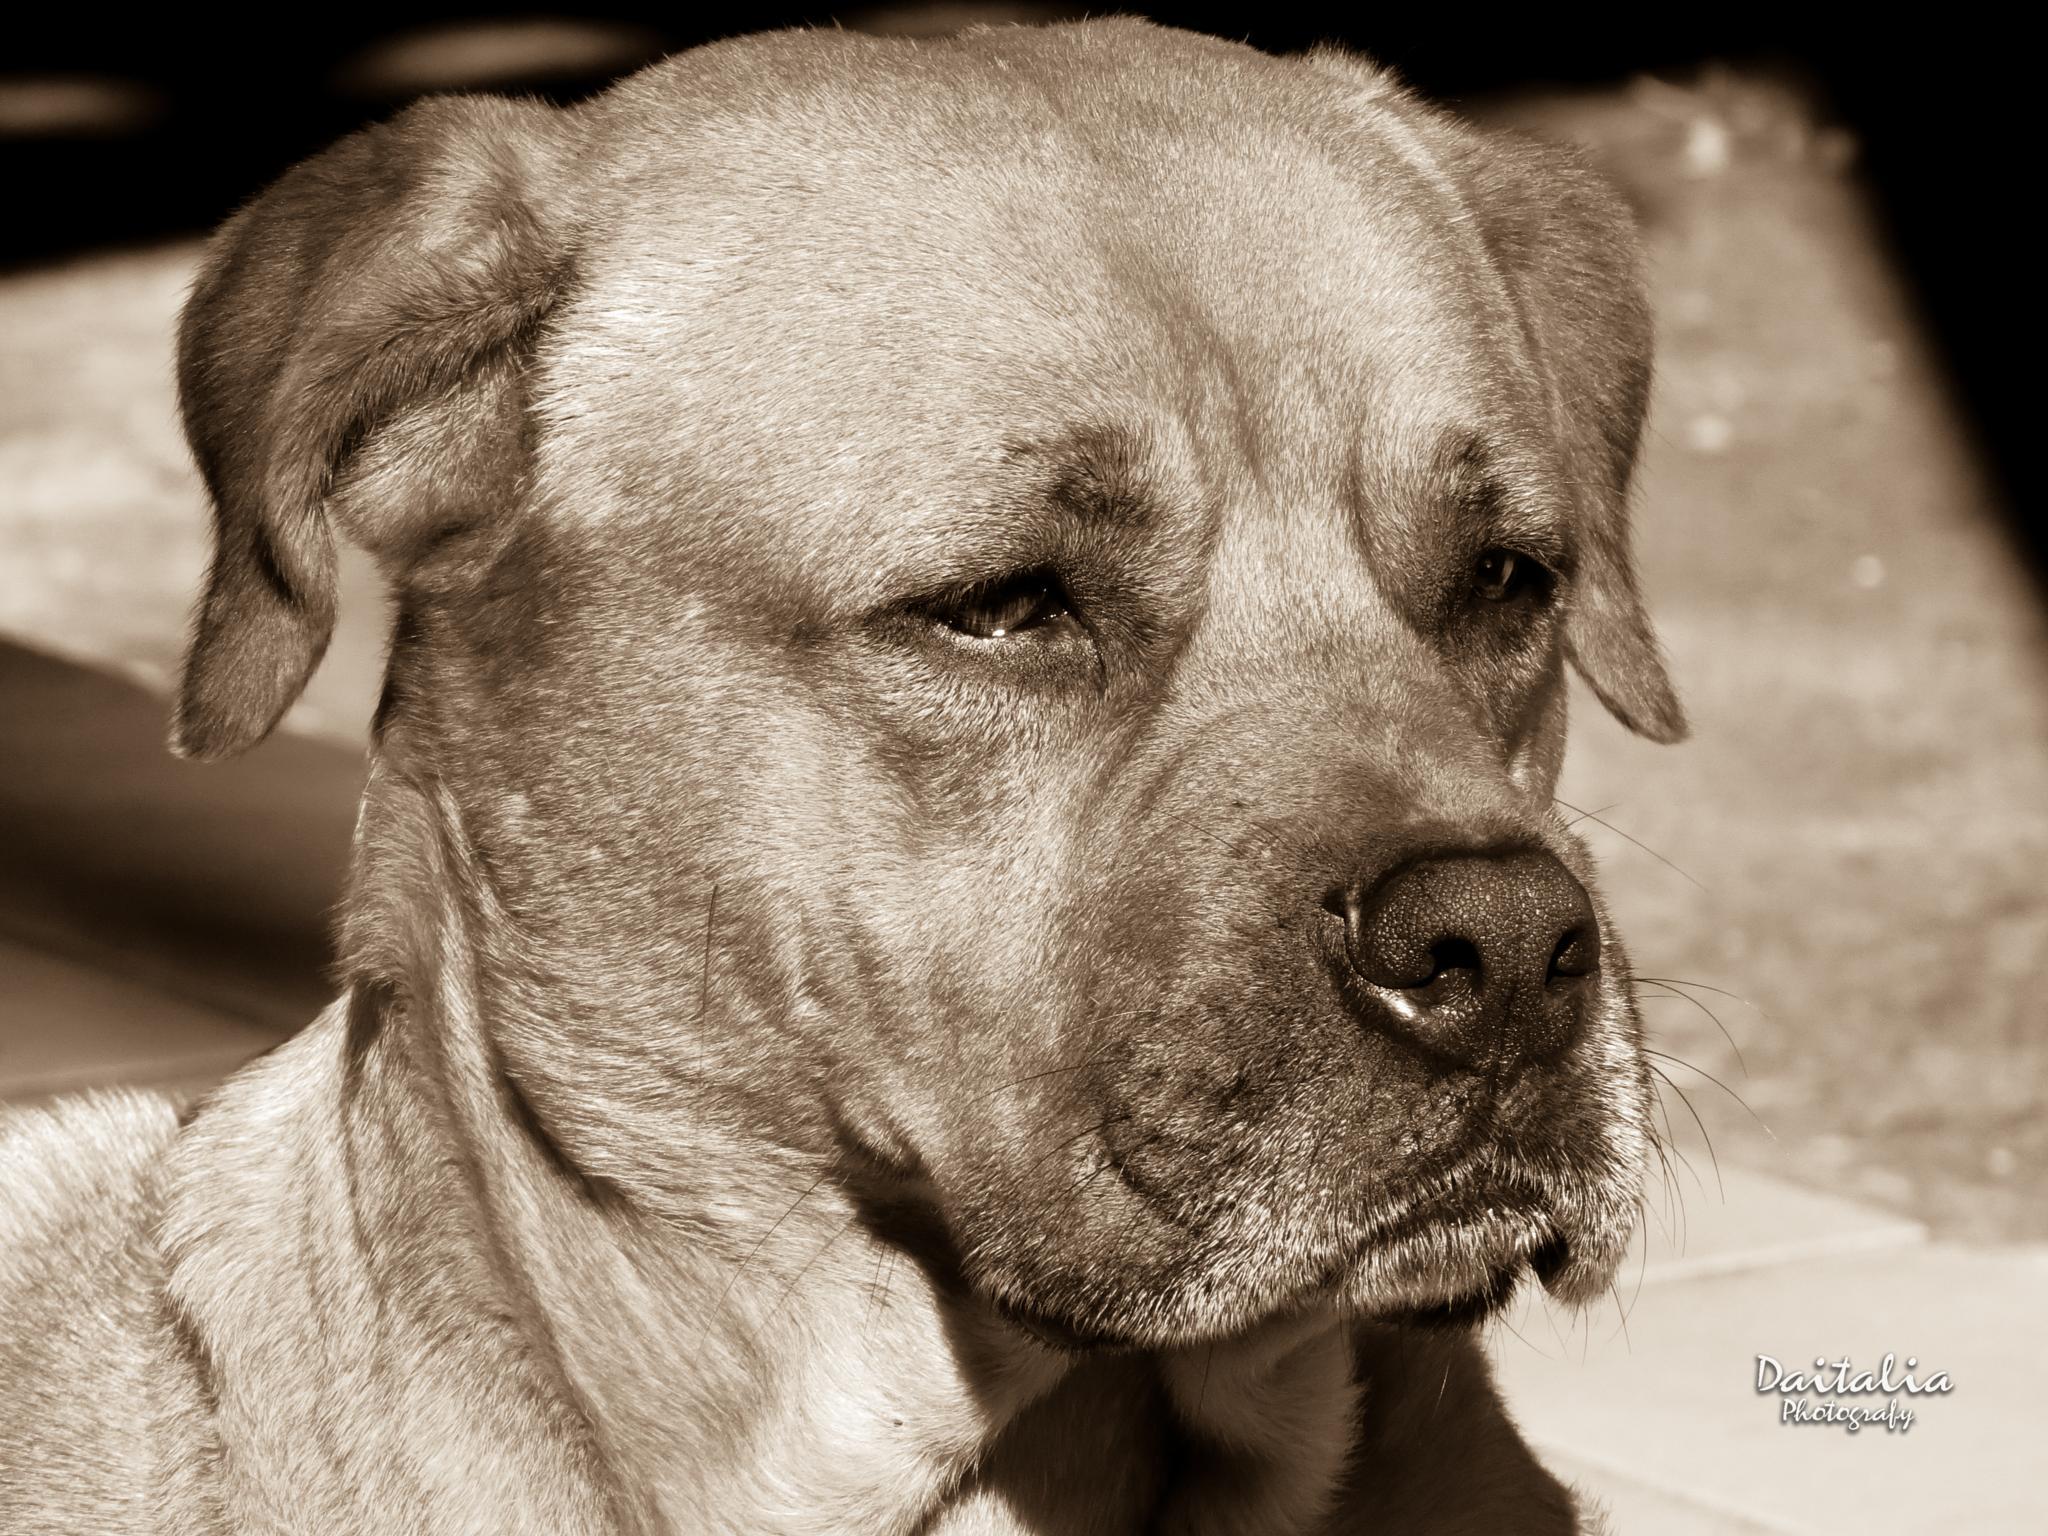 Dog by Daitalia Photography